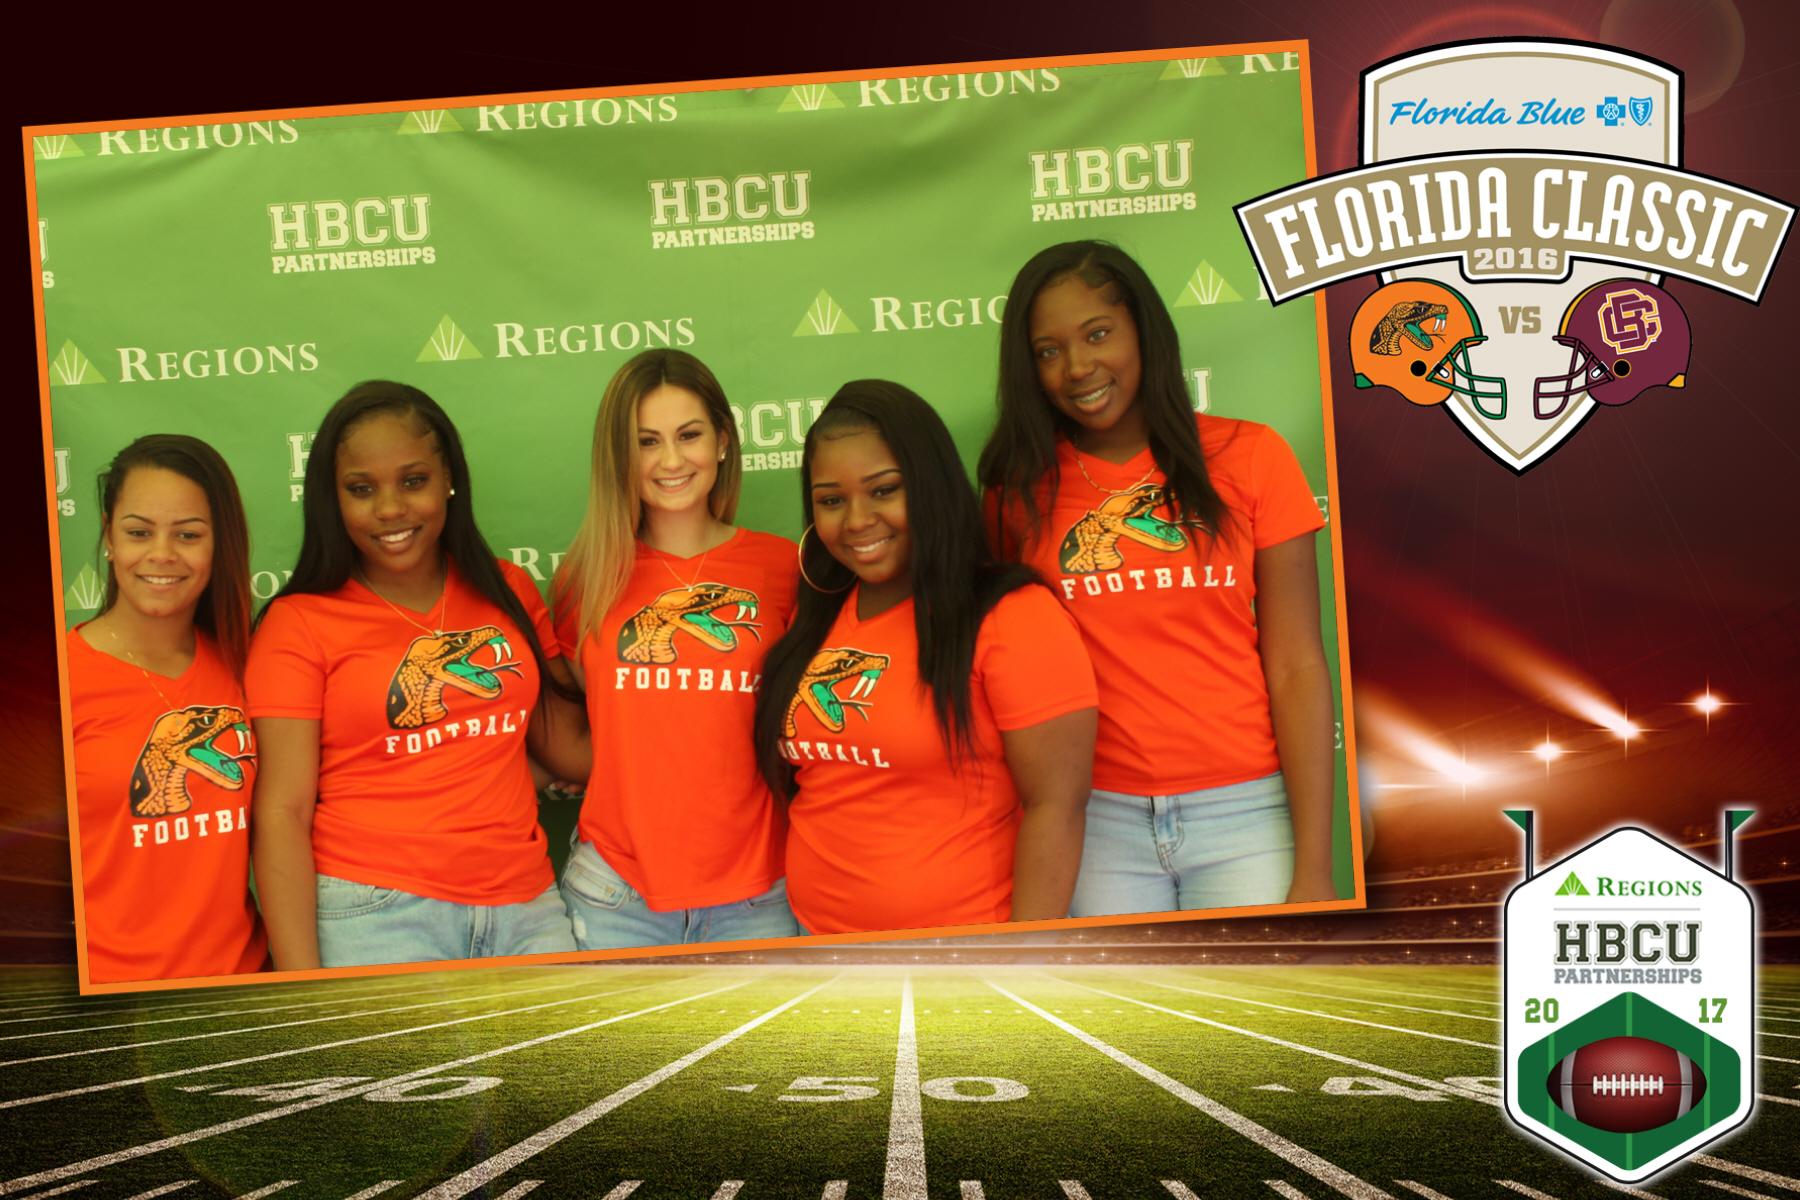 Regions HBCU - Florida Classic